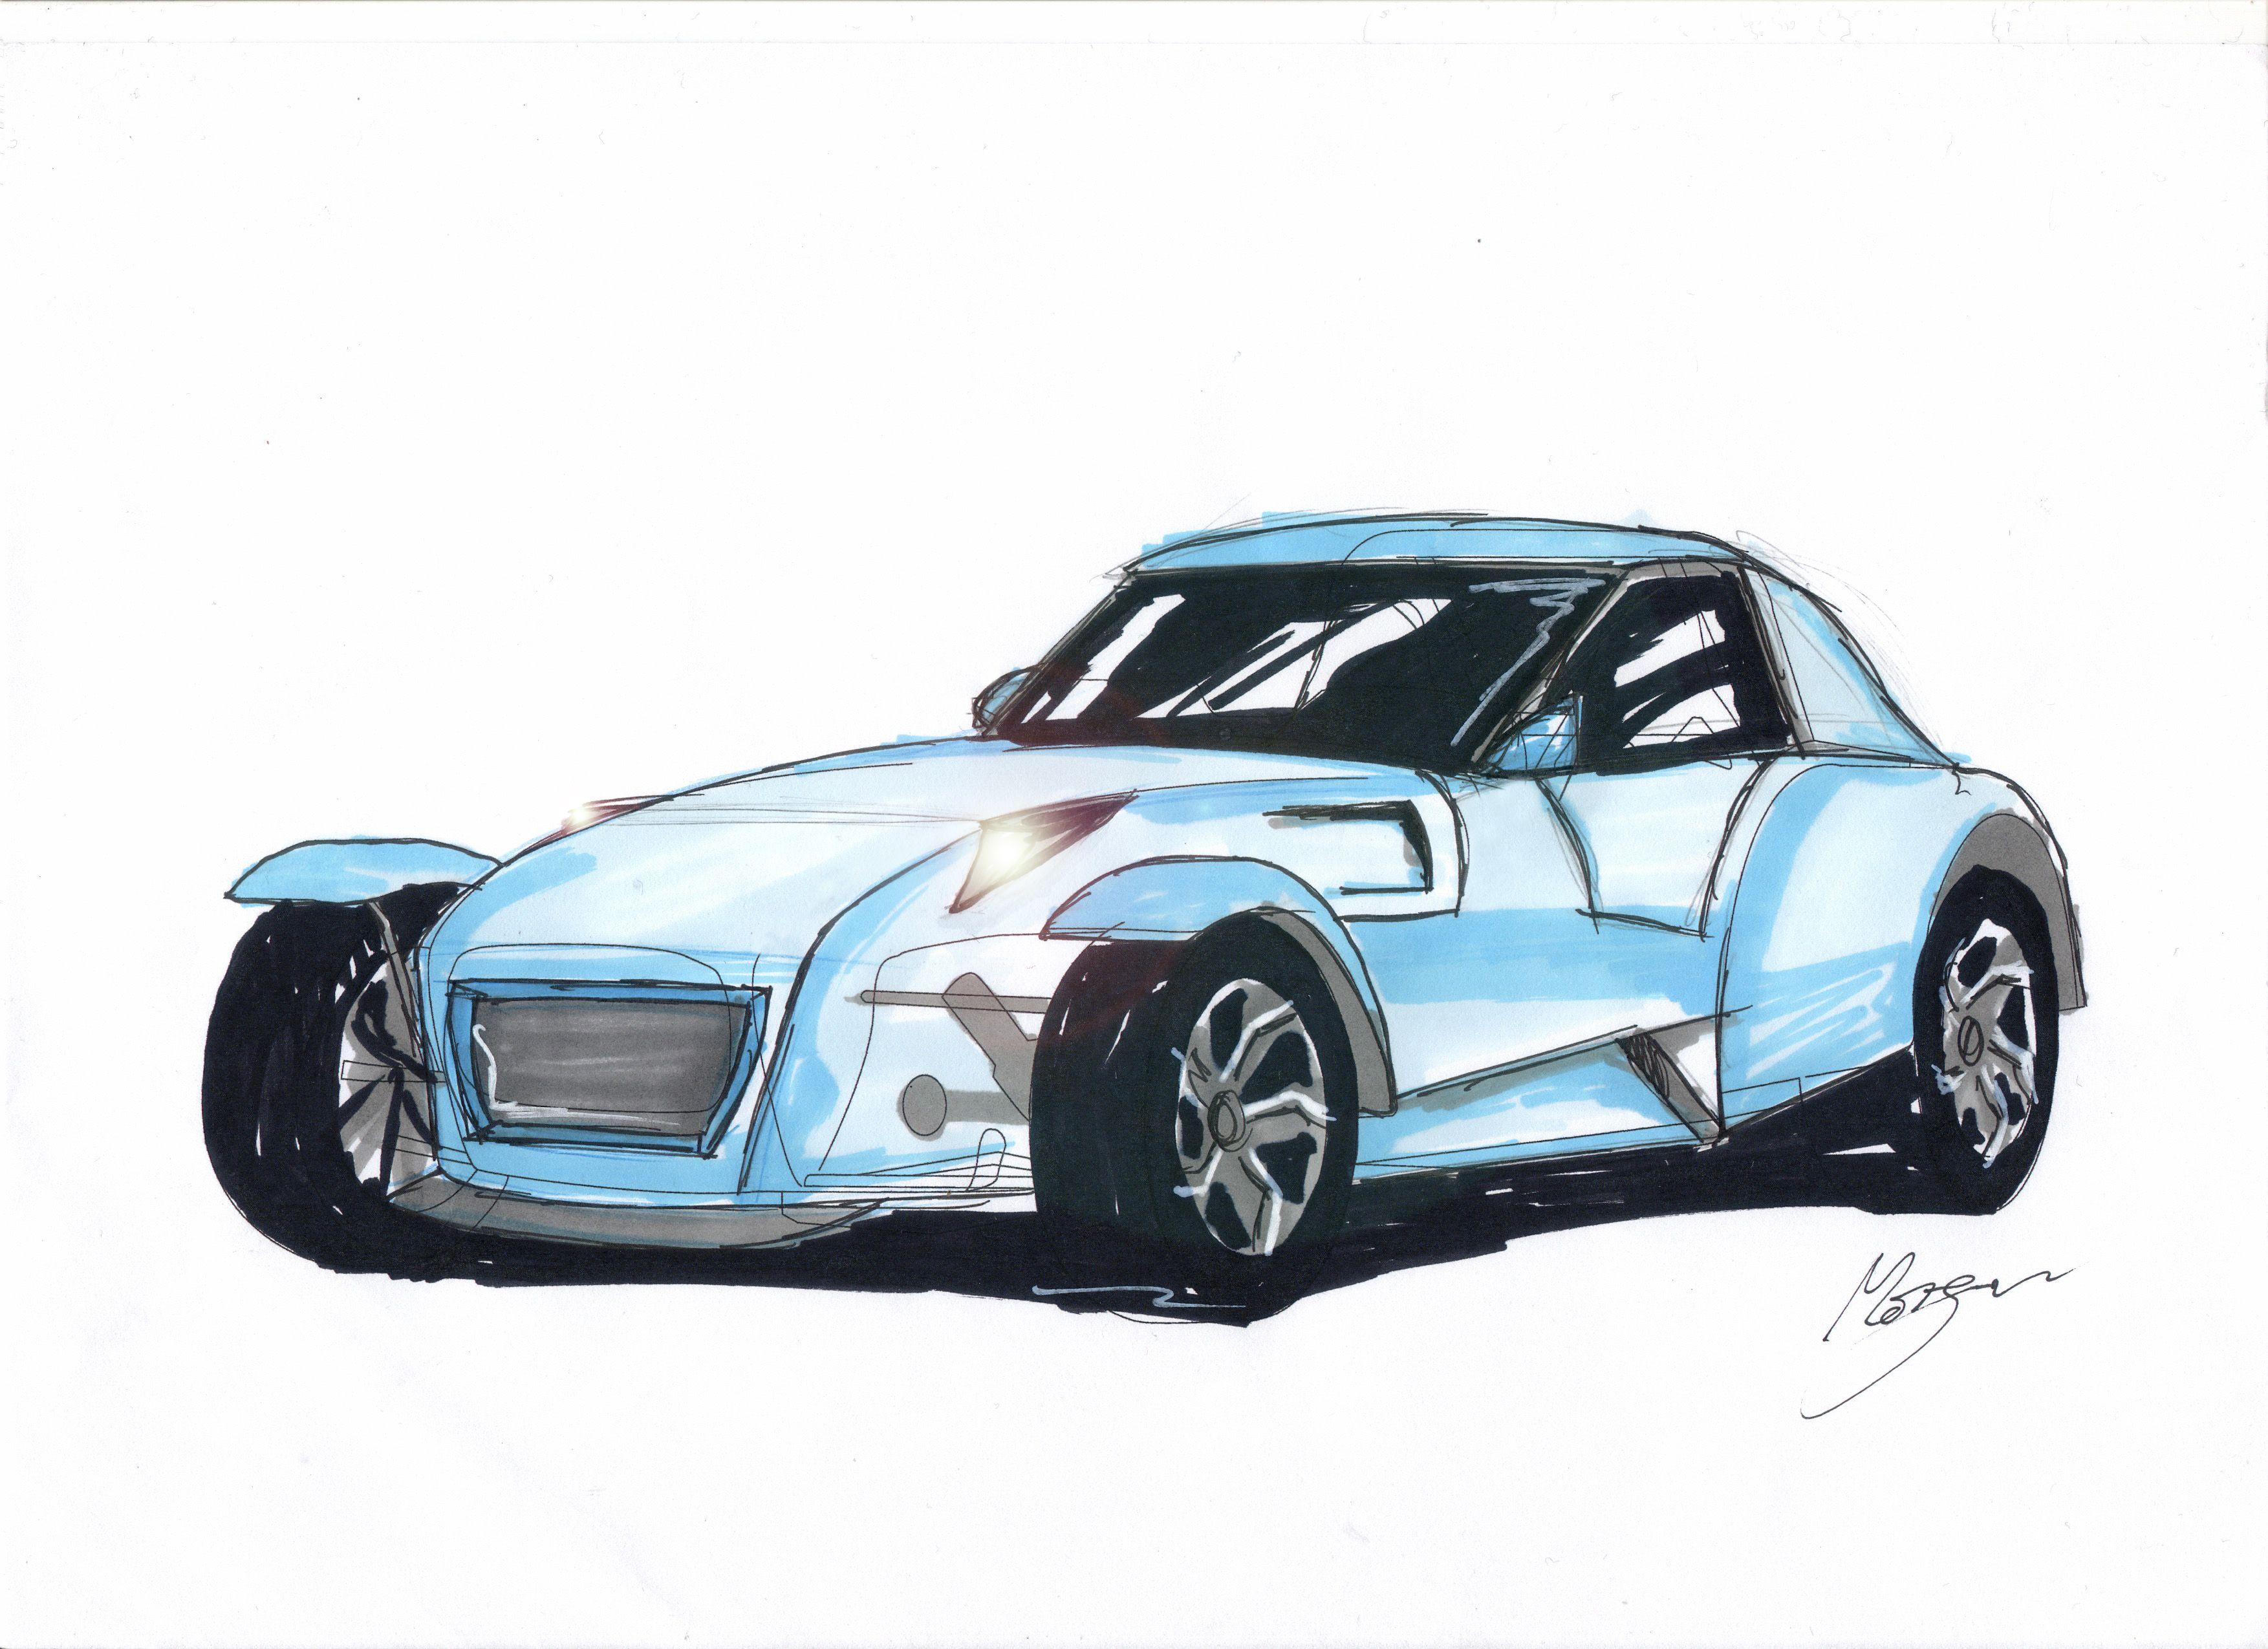 kit cars for sale caterham westfield sports cars. Black Bedroom Furniture Sets. Home Design Ideas